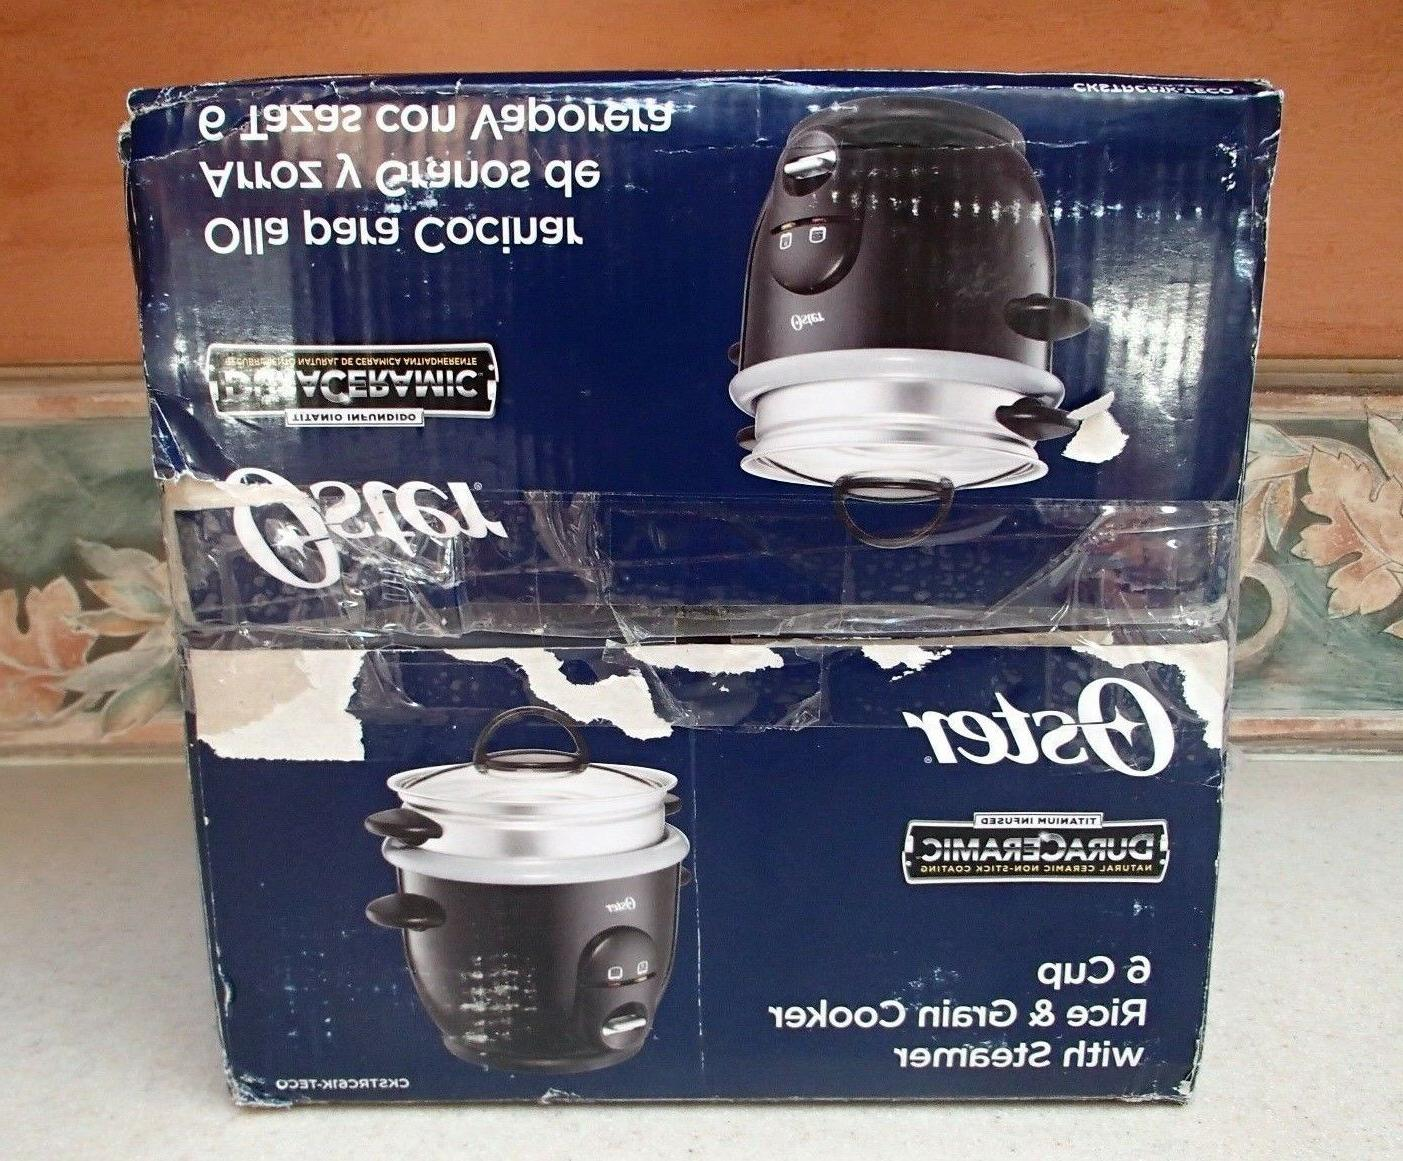 OSTER Rice Food Steamer Kitchen 6 - NIB,RV$35